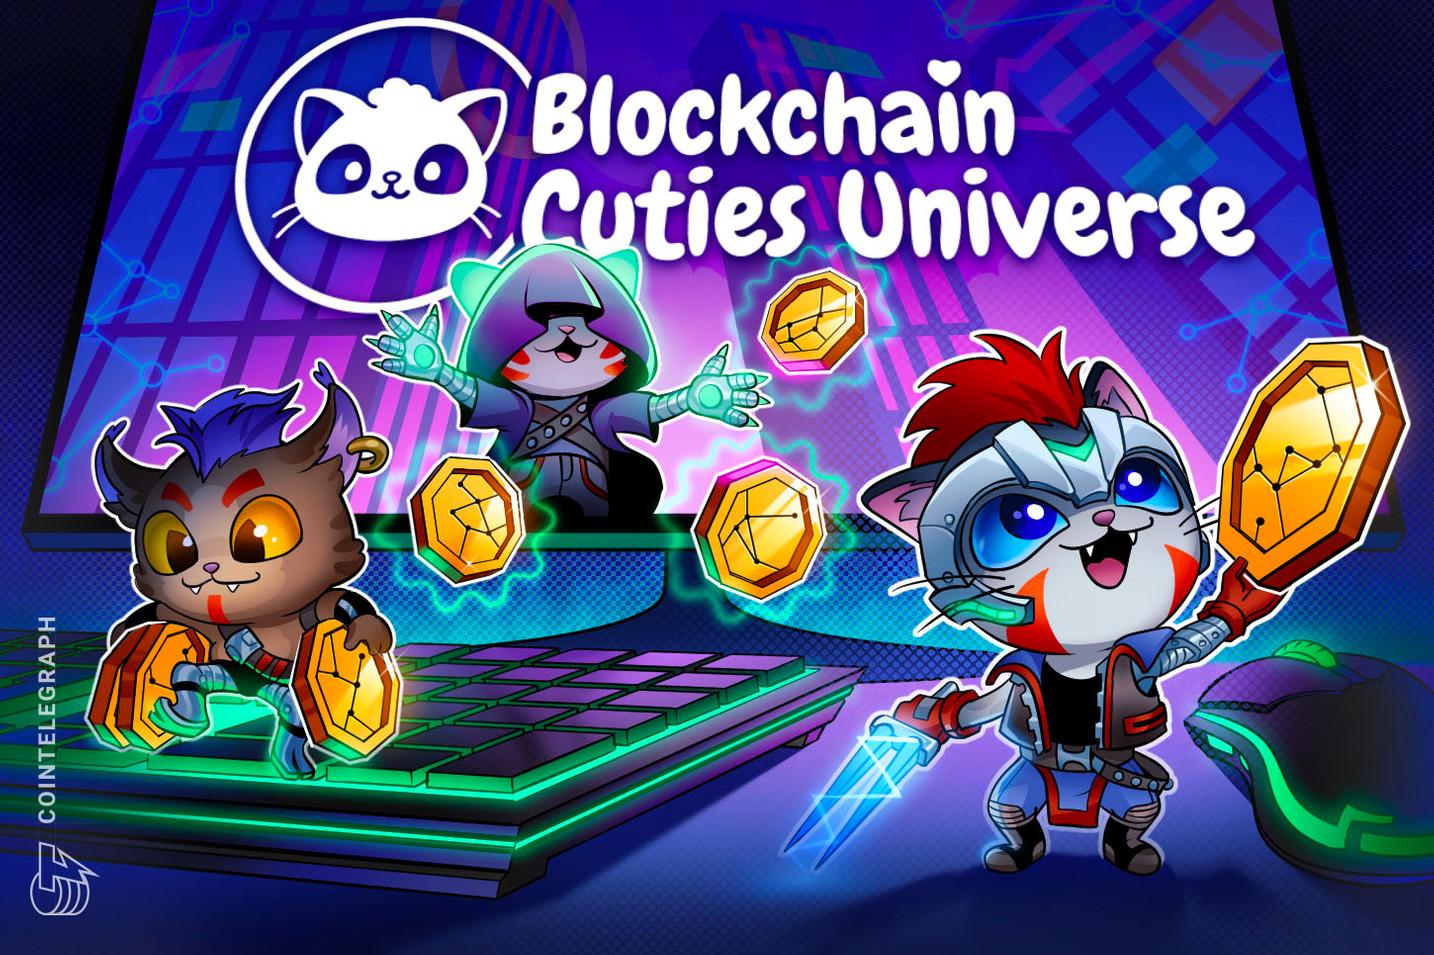 NFT-based game champions decentralized digital ownership